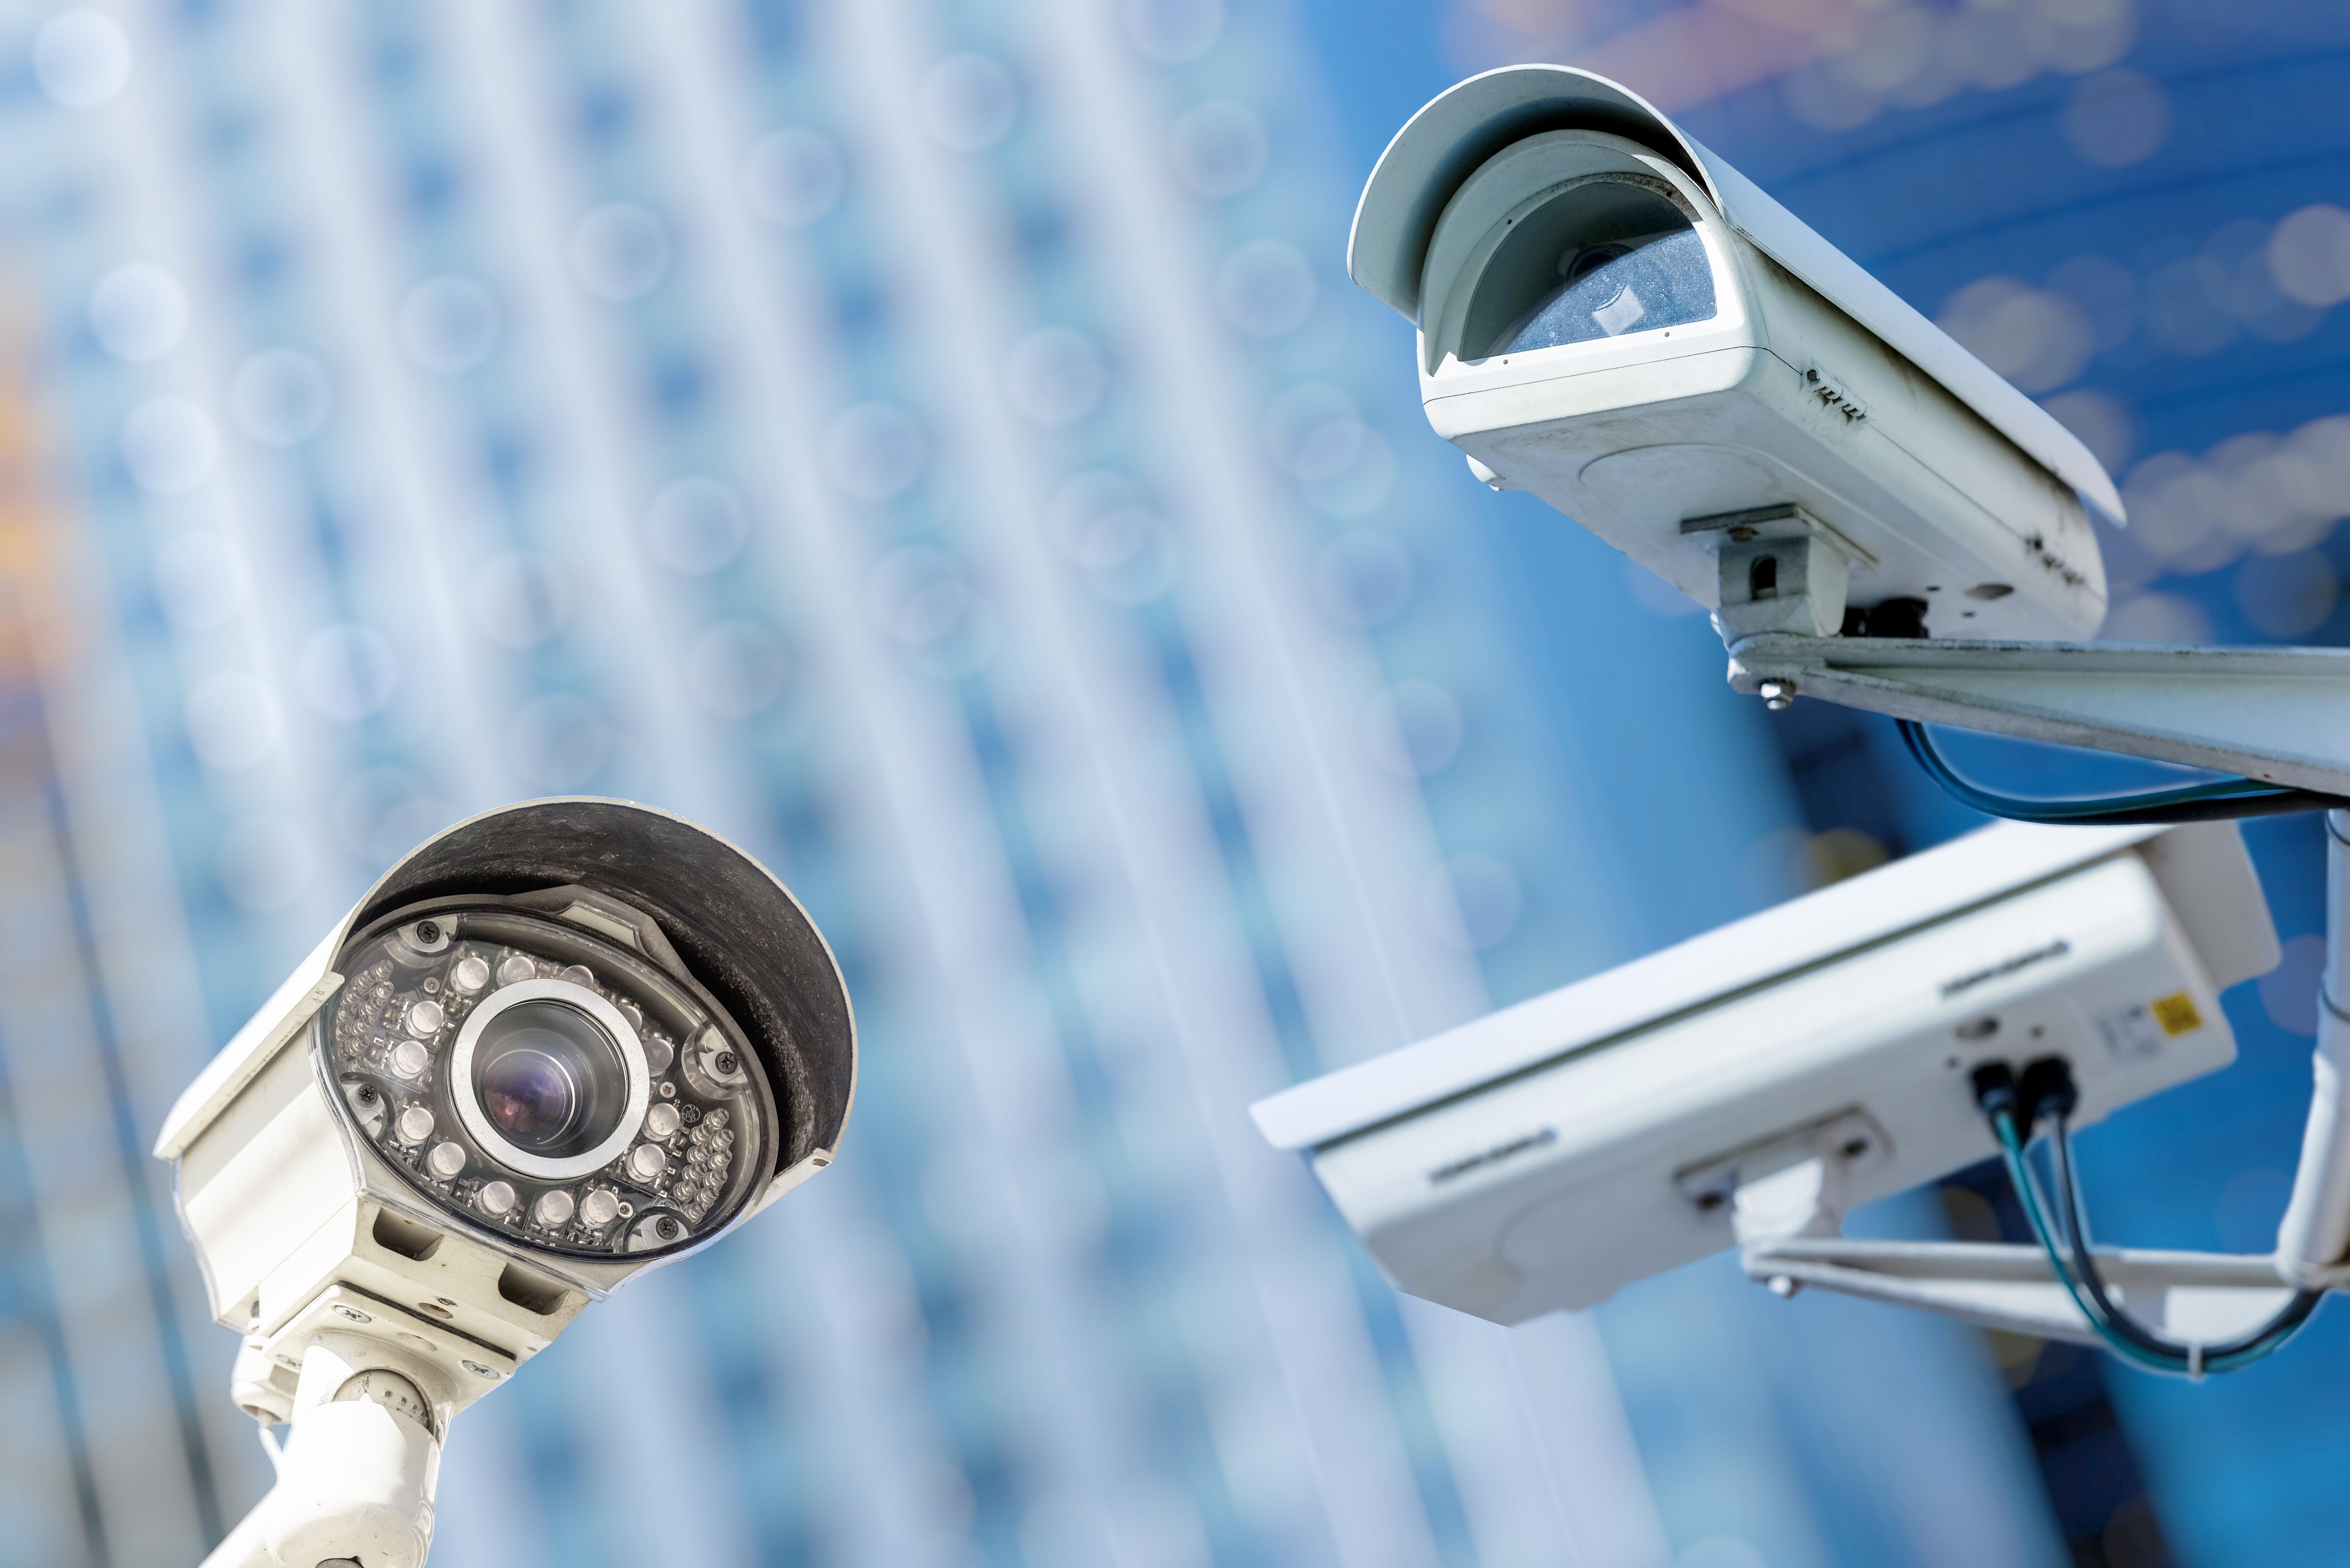 Georgia Laws on Spy Cameras